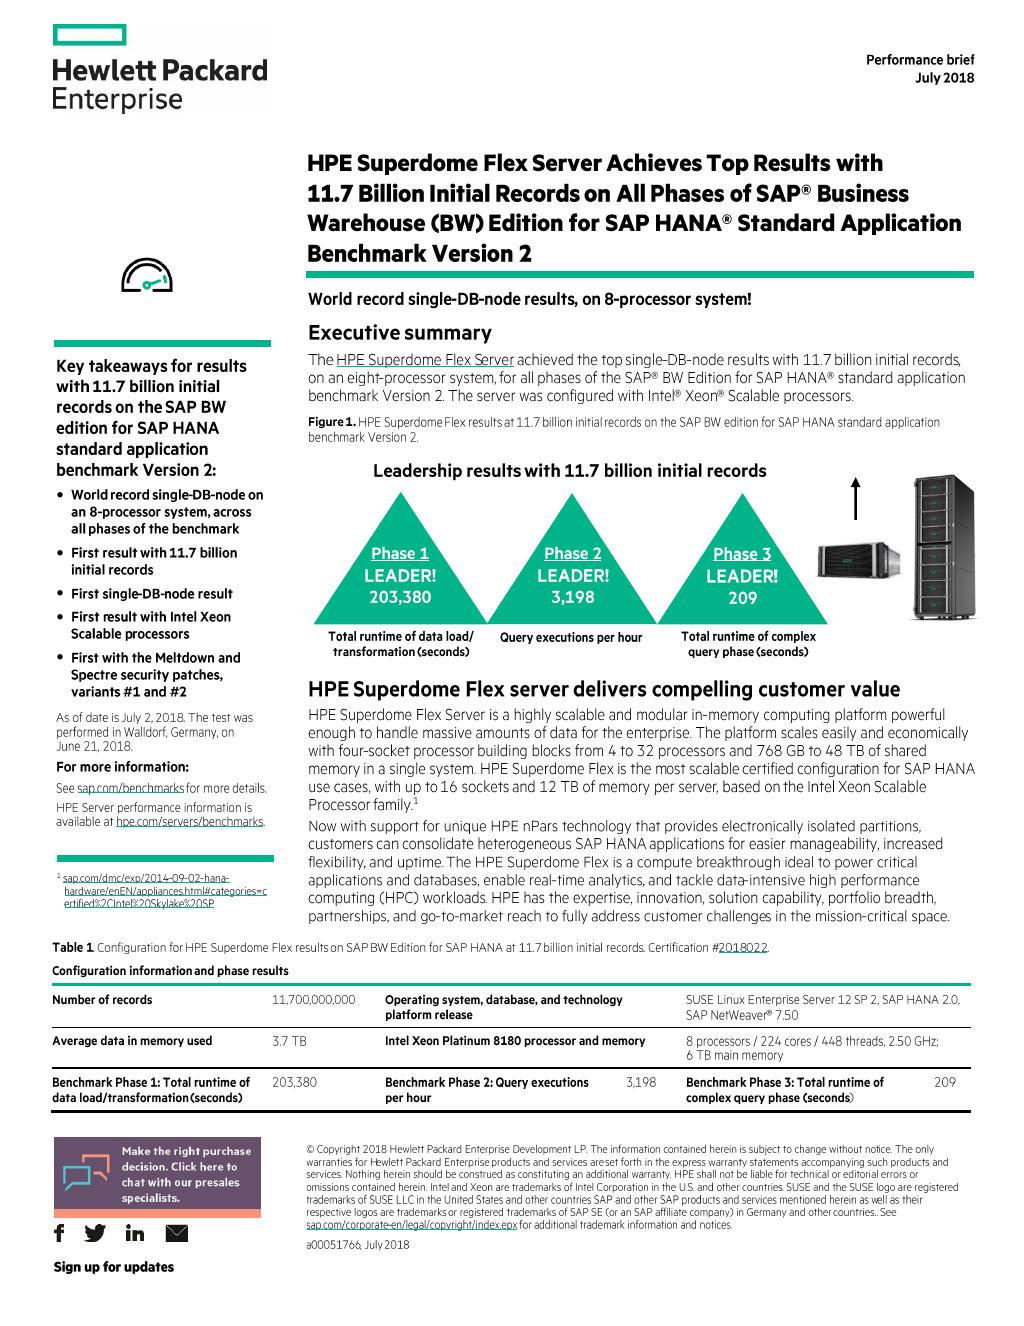 HPE ProLiant DL560 Gen10 takes top spots on SAP BW for HANA